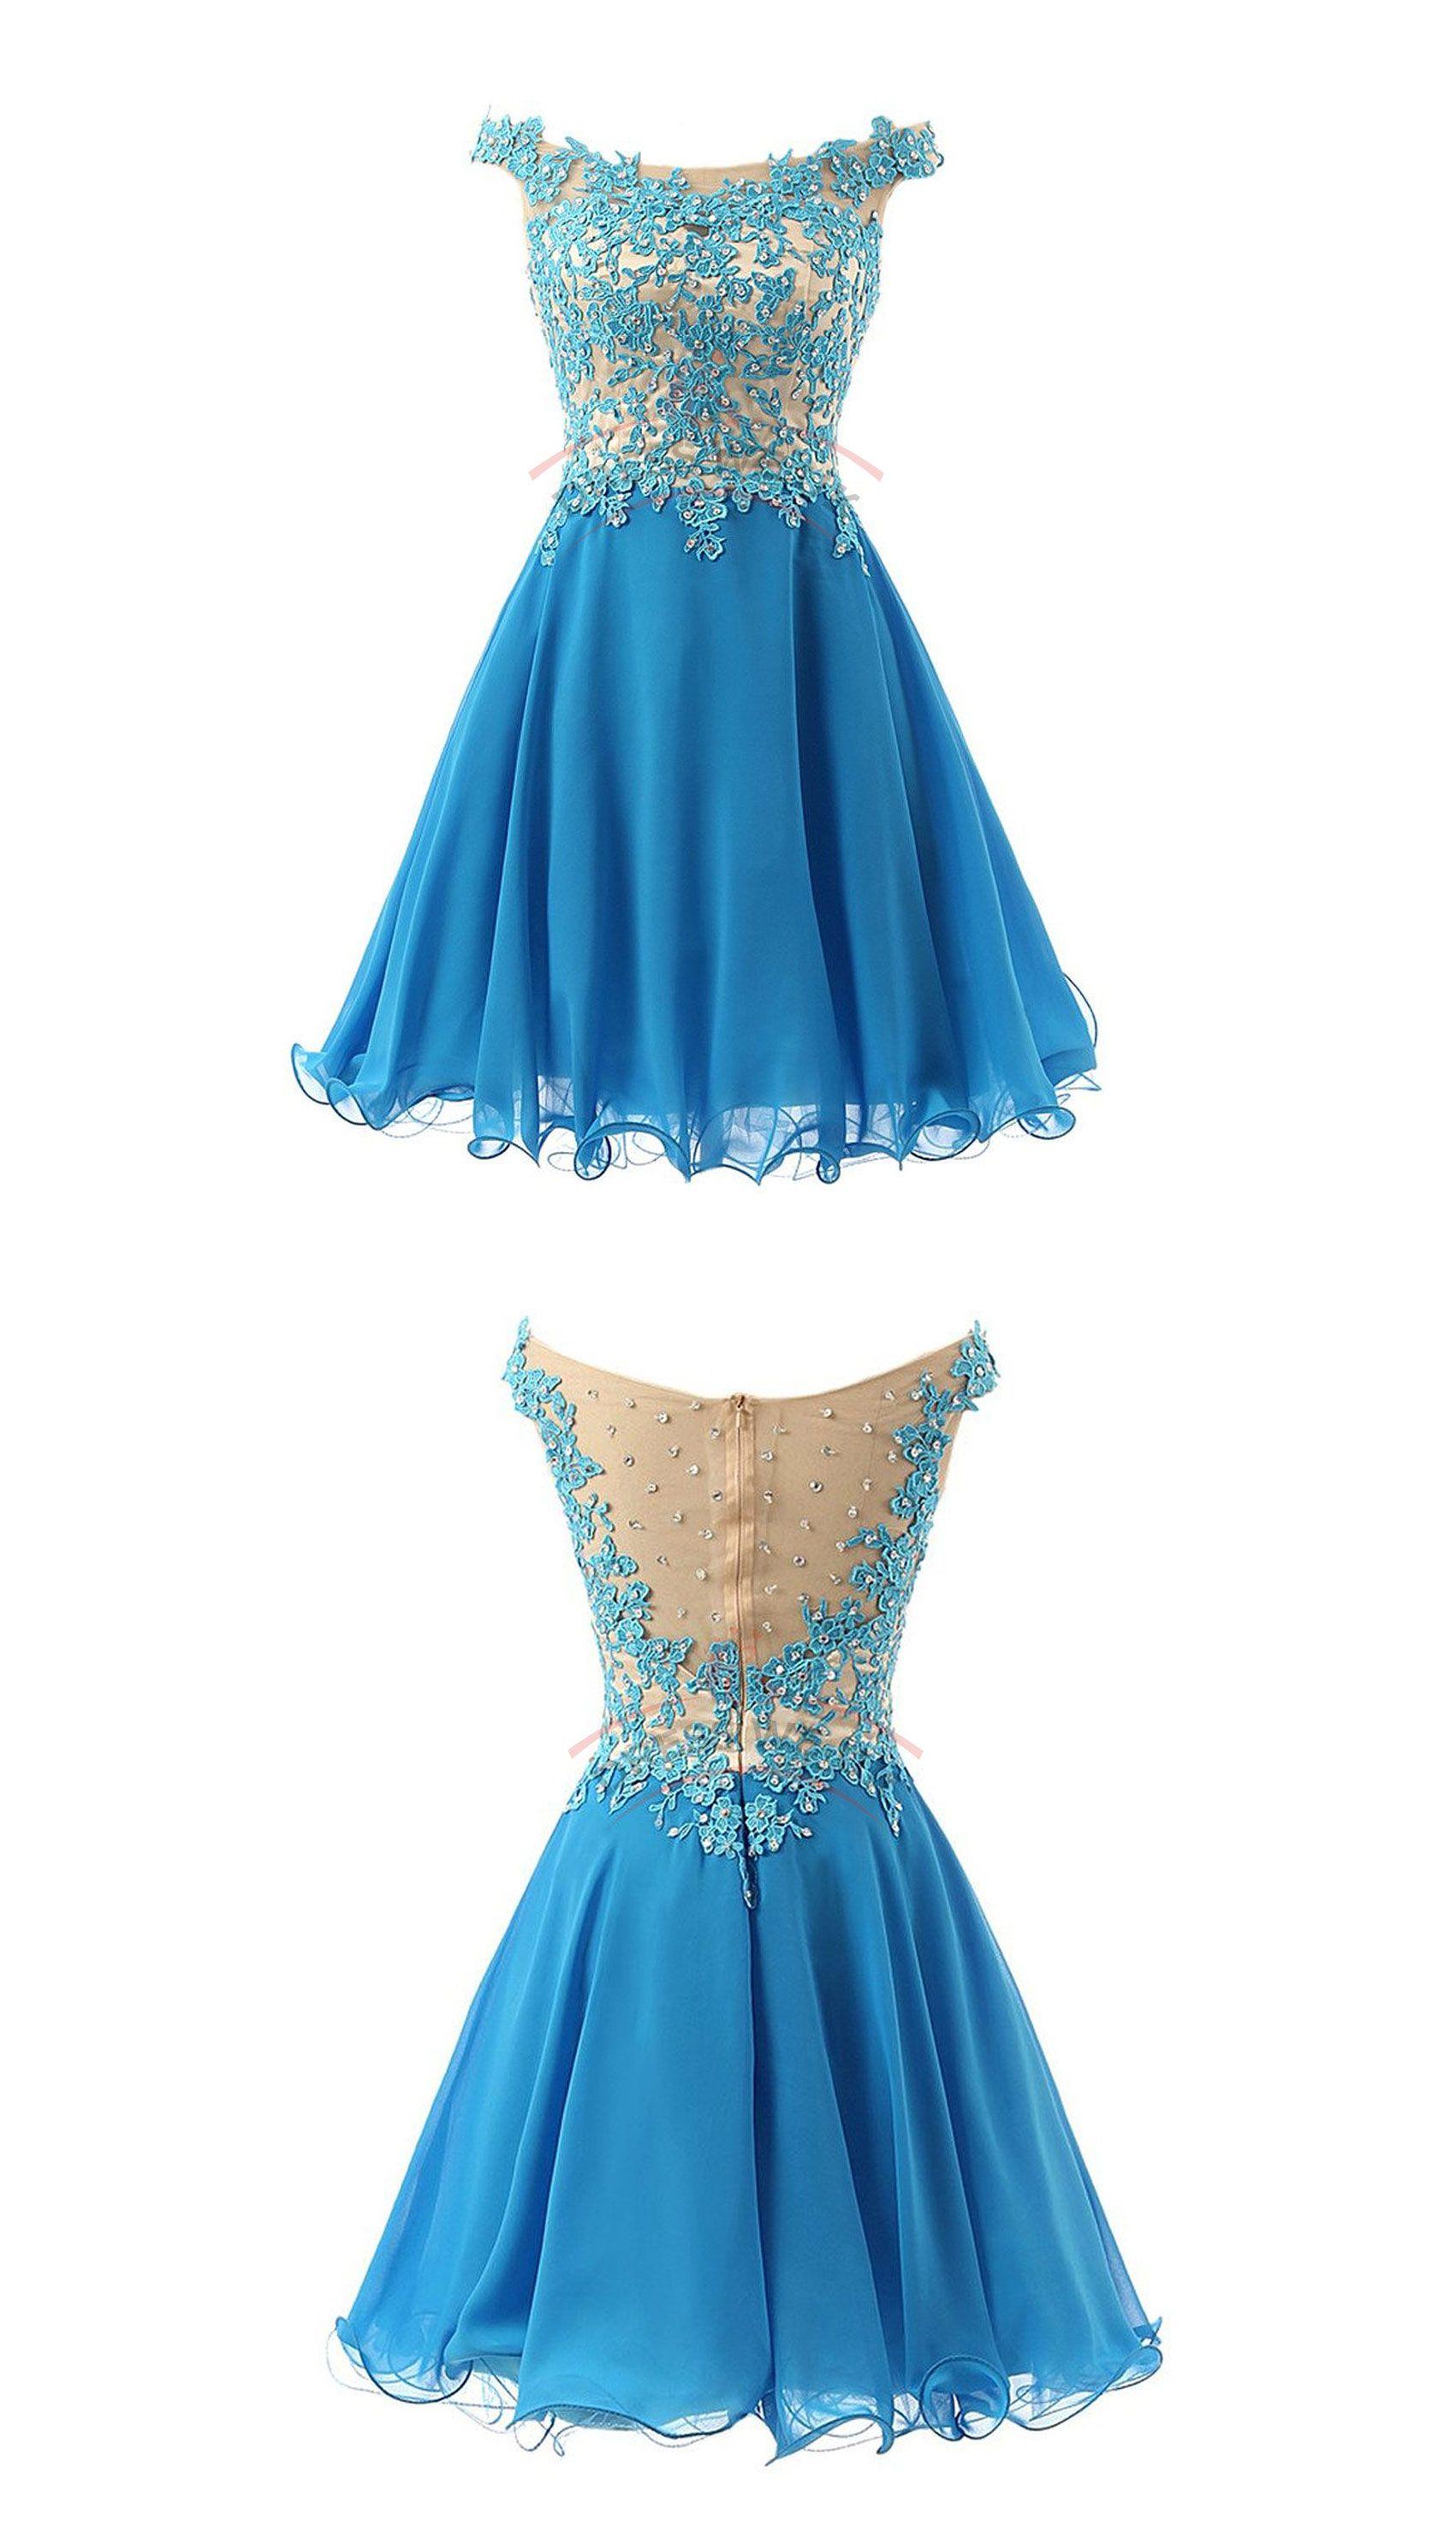 Pretty Straps Lace Party Dresses,Bodice Party Dresses,Short Party Dresses,Applique Party Dresses